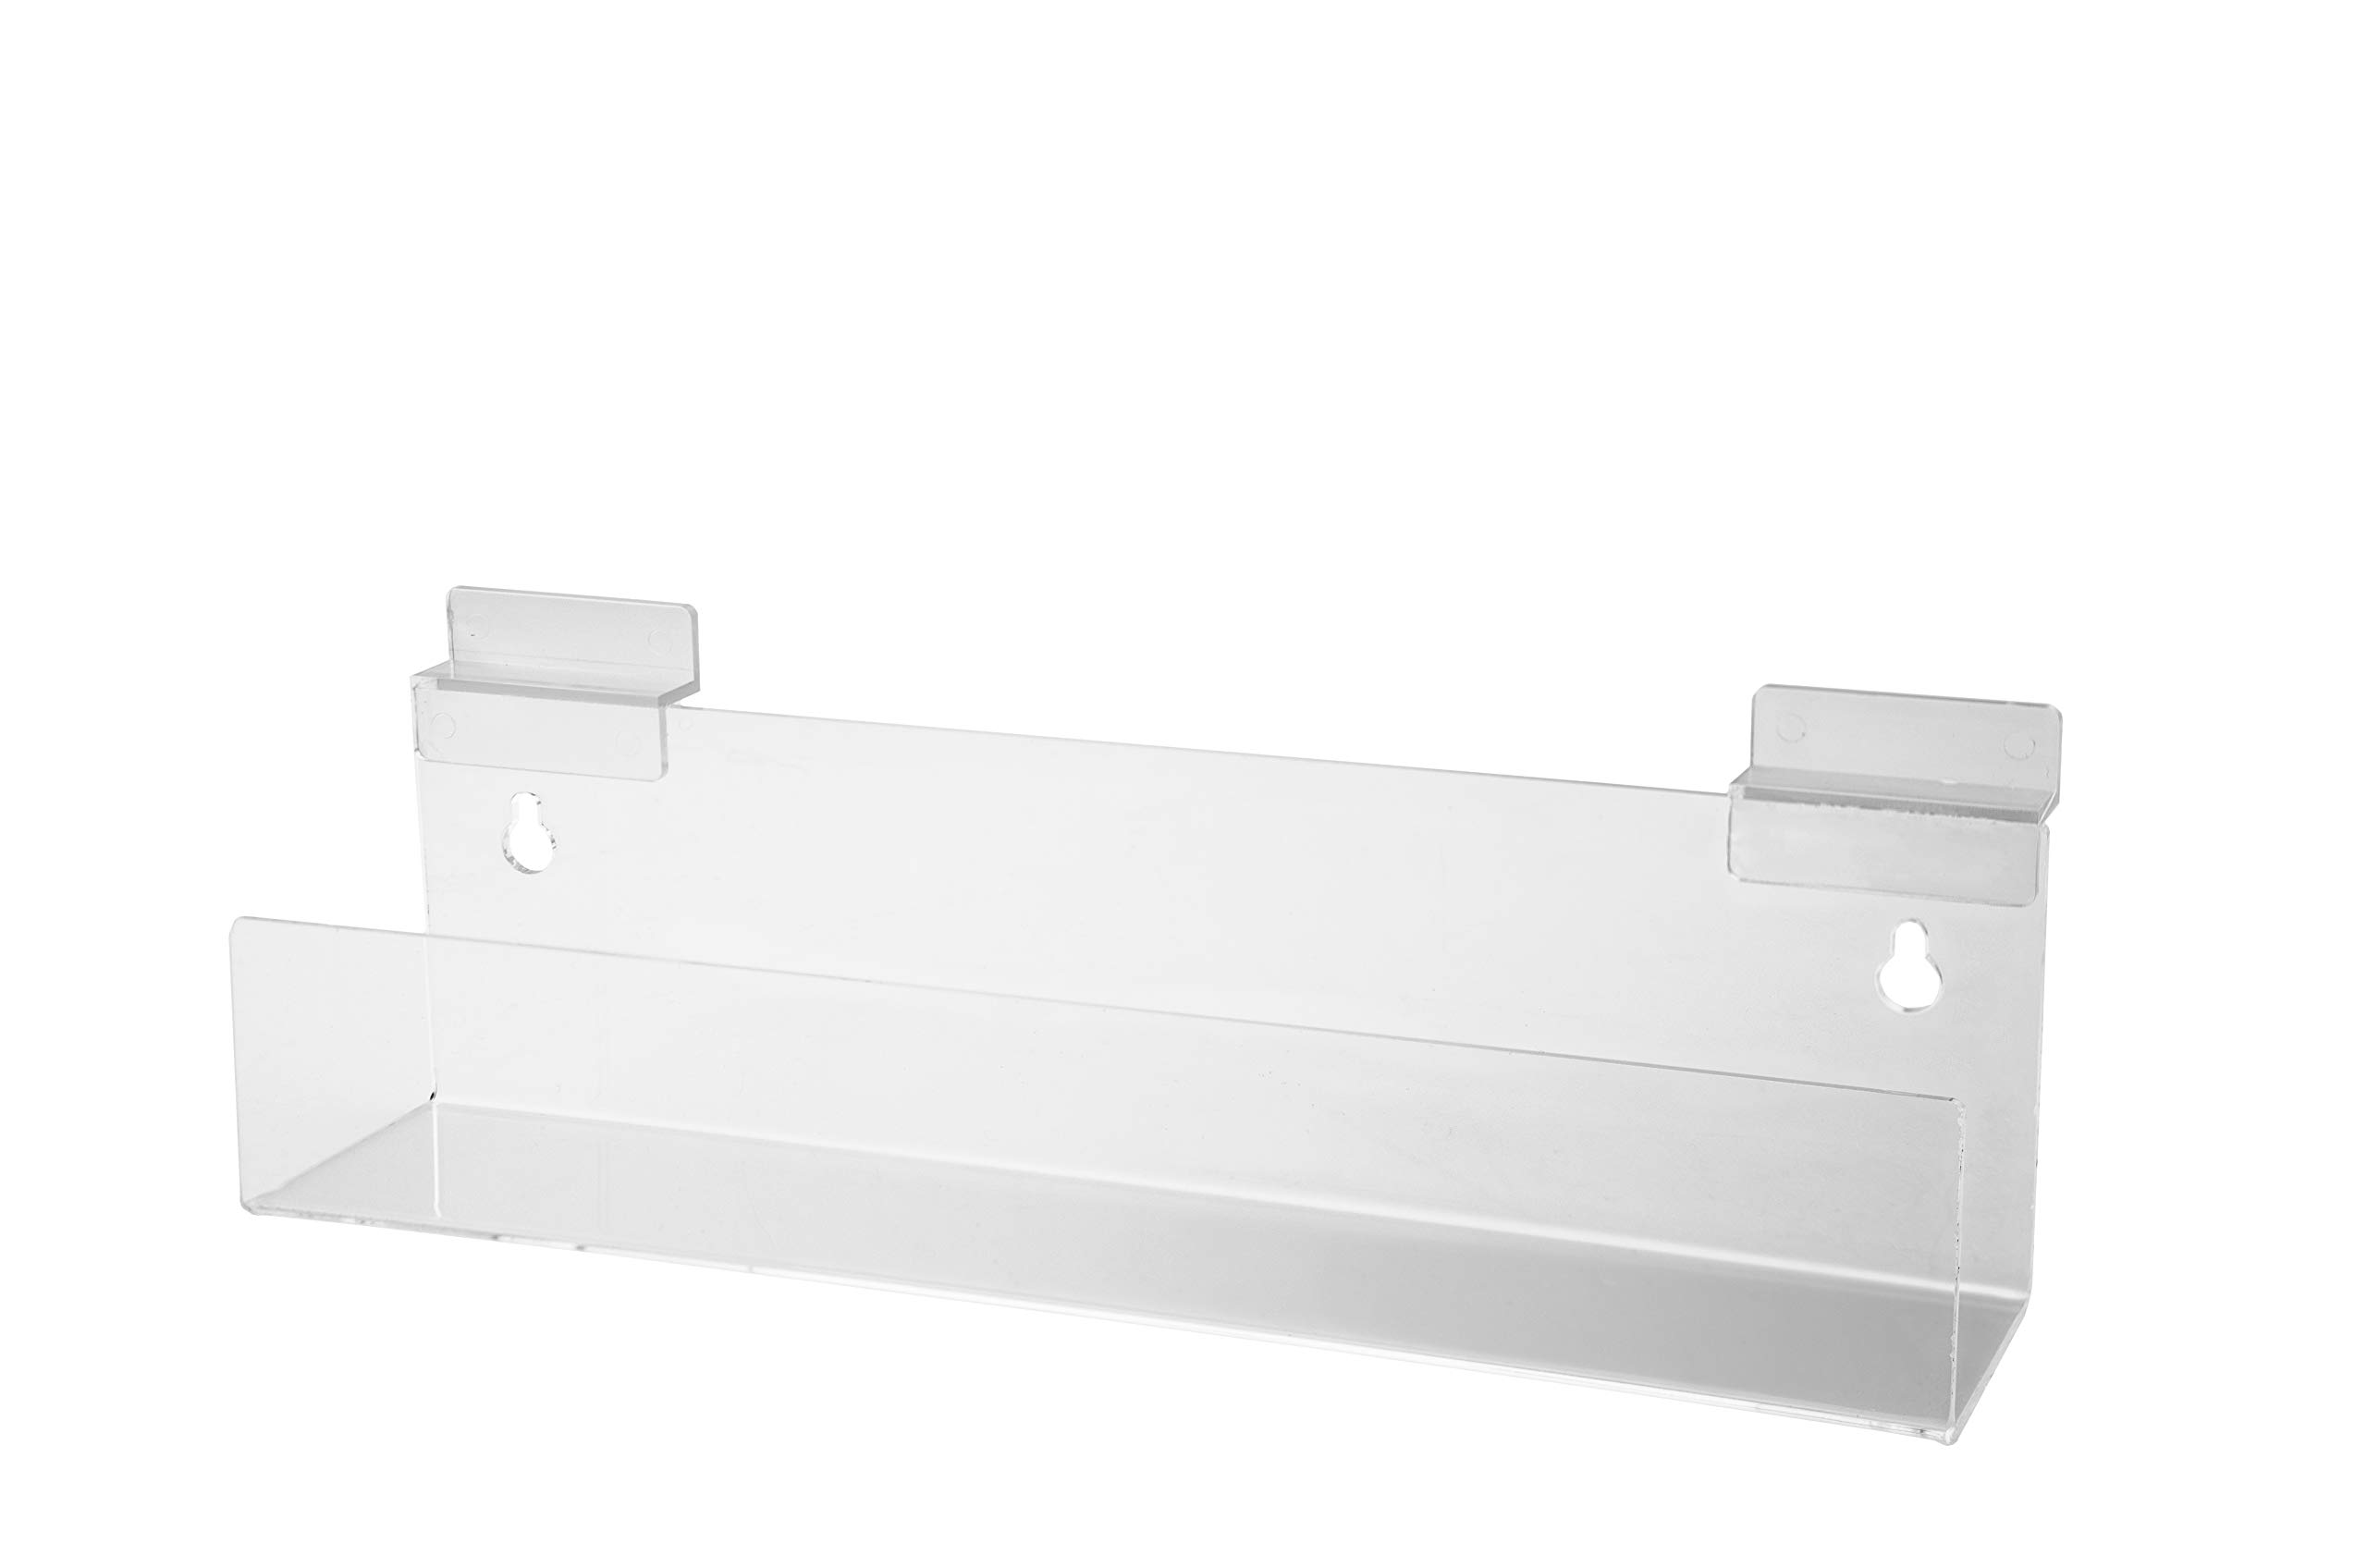 Marketing Holders Slatwall Shelf J Book Brochure Product Holder 12'' Wide x 2.5'' Deep 2'' Lip Clear Pack of 24 Acrylic